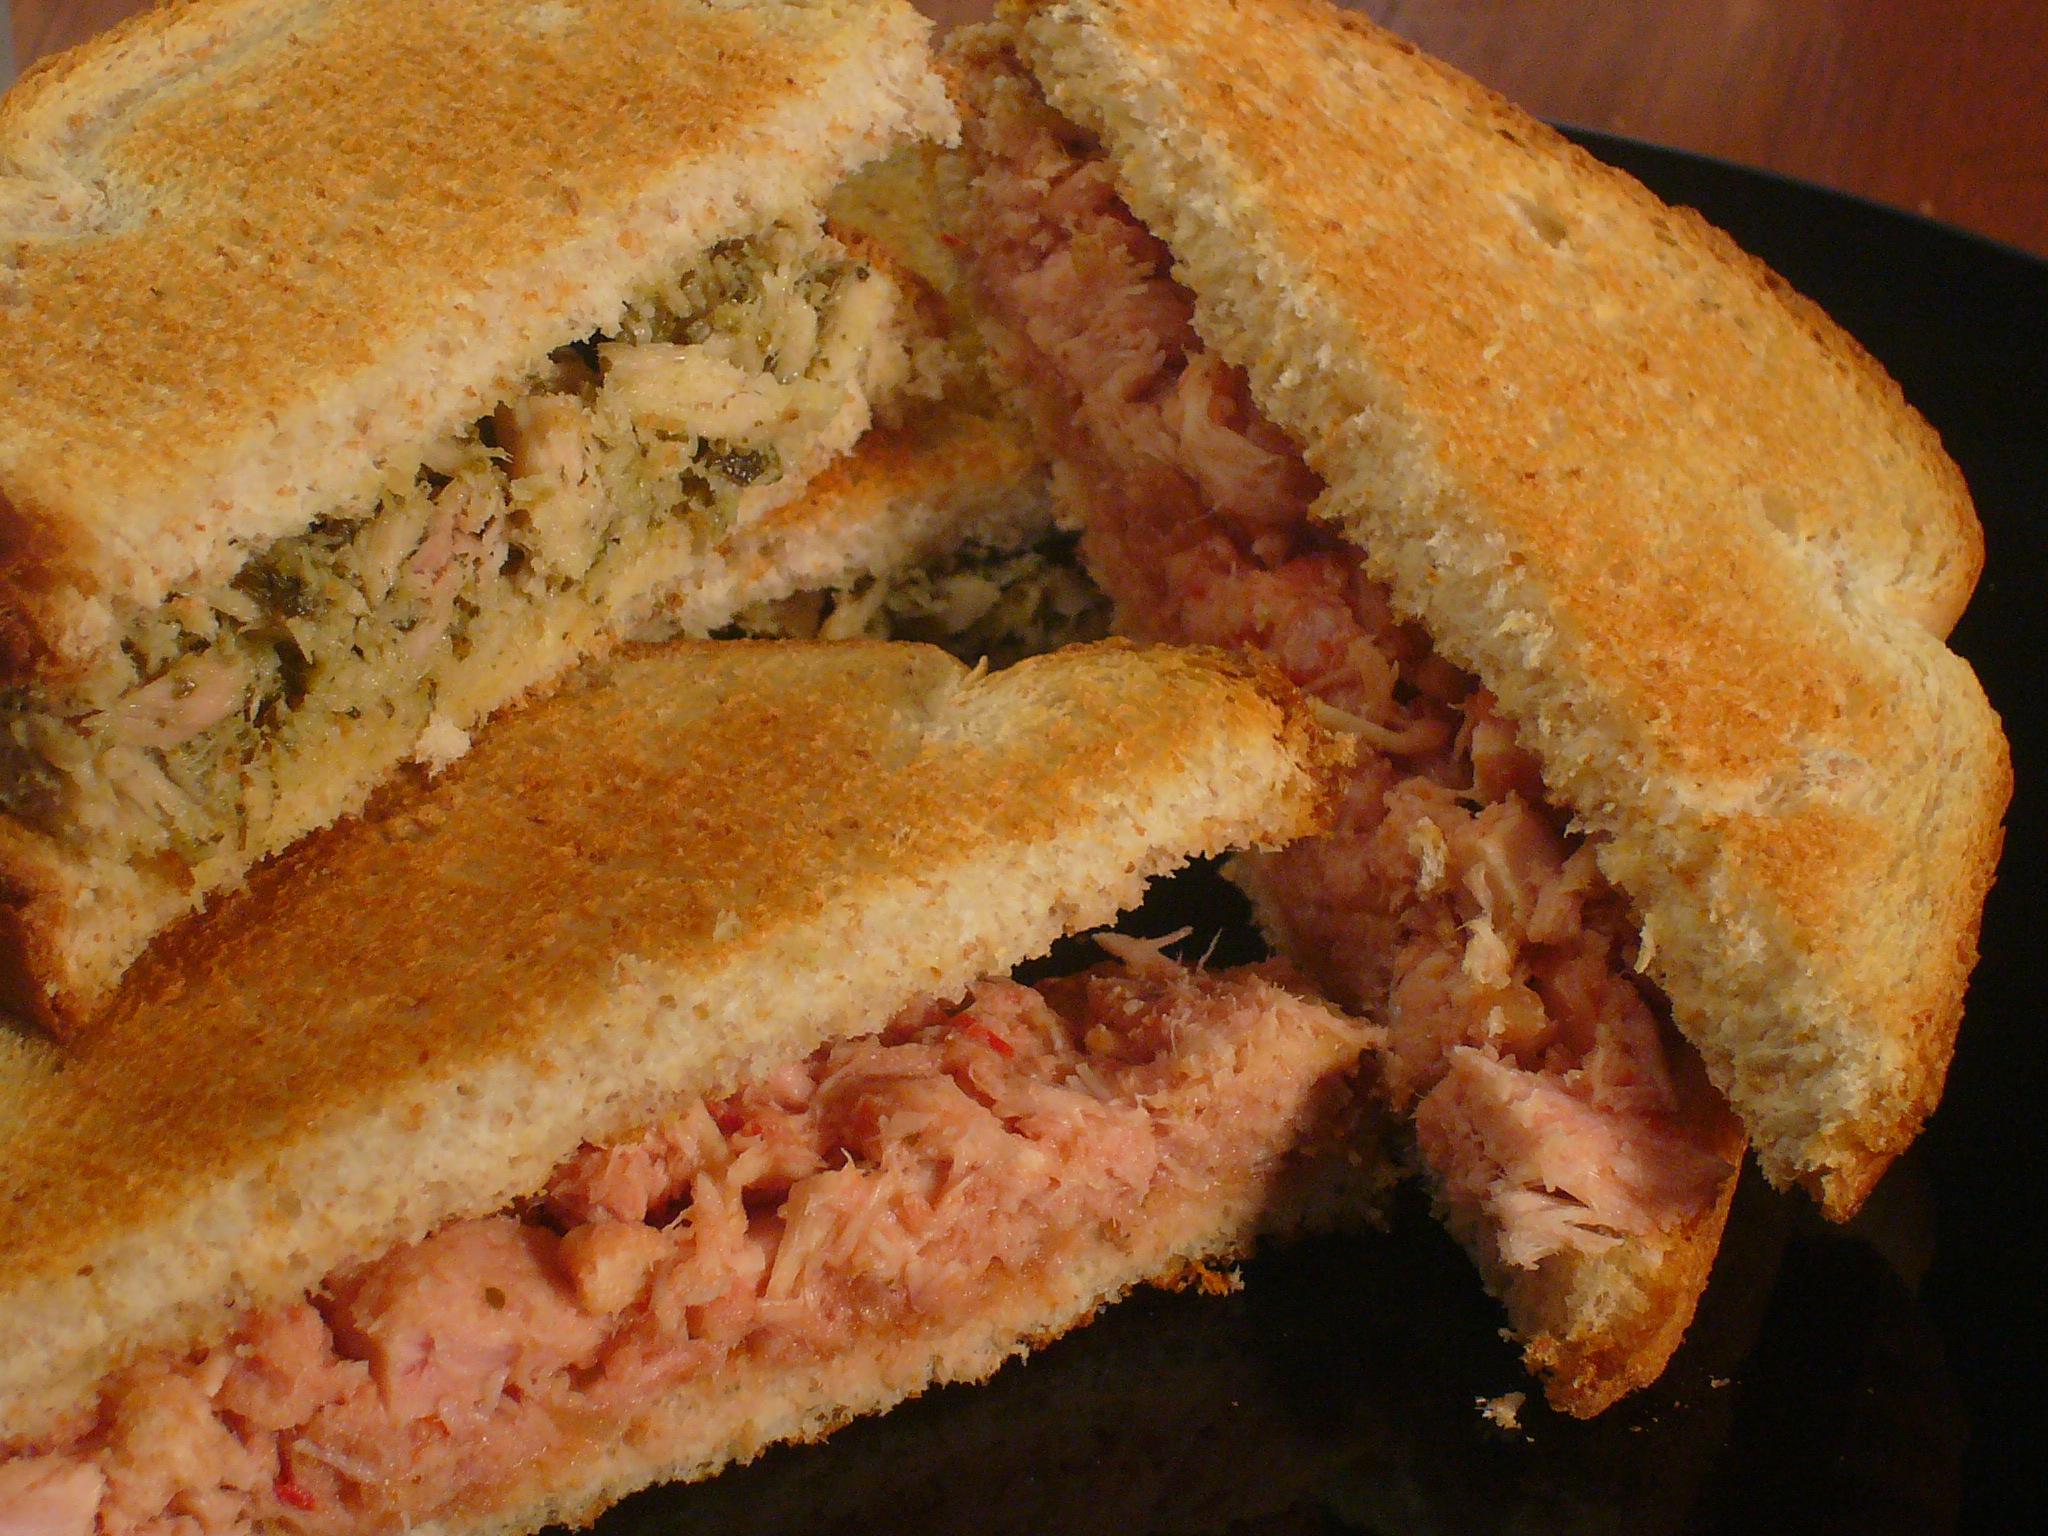 [Collegiate Meals] Two Way Tuna Sandwiches